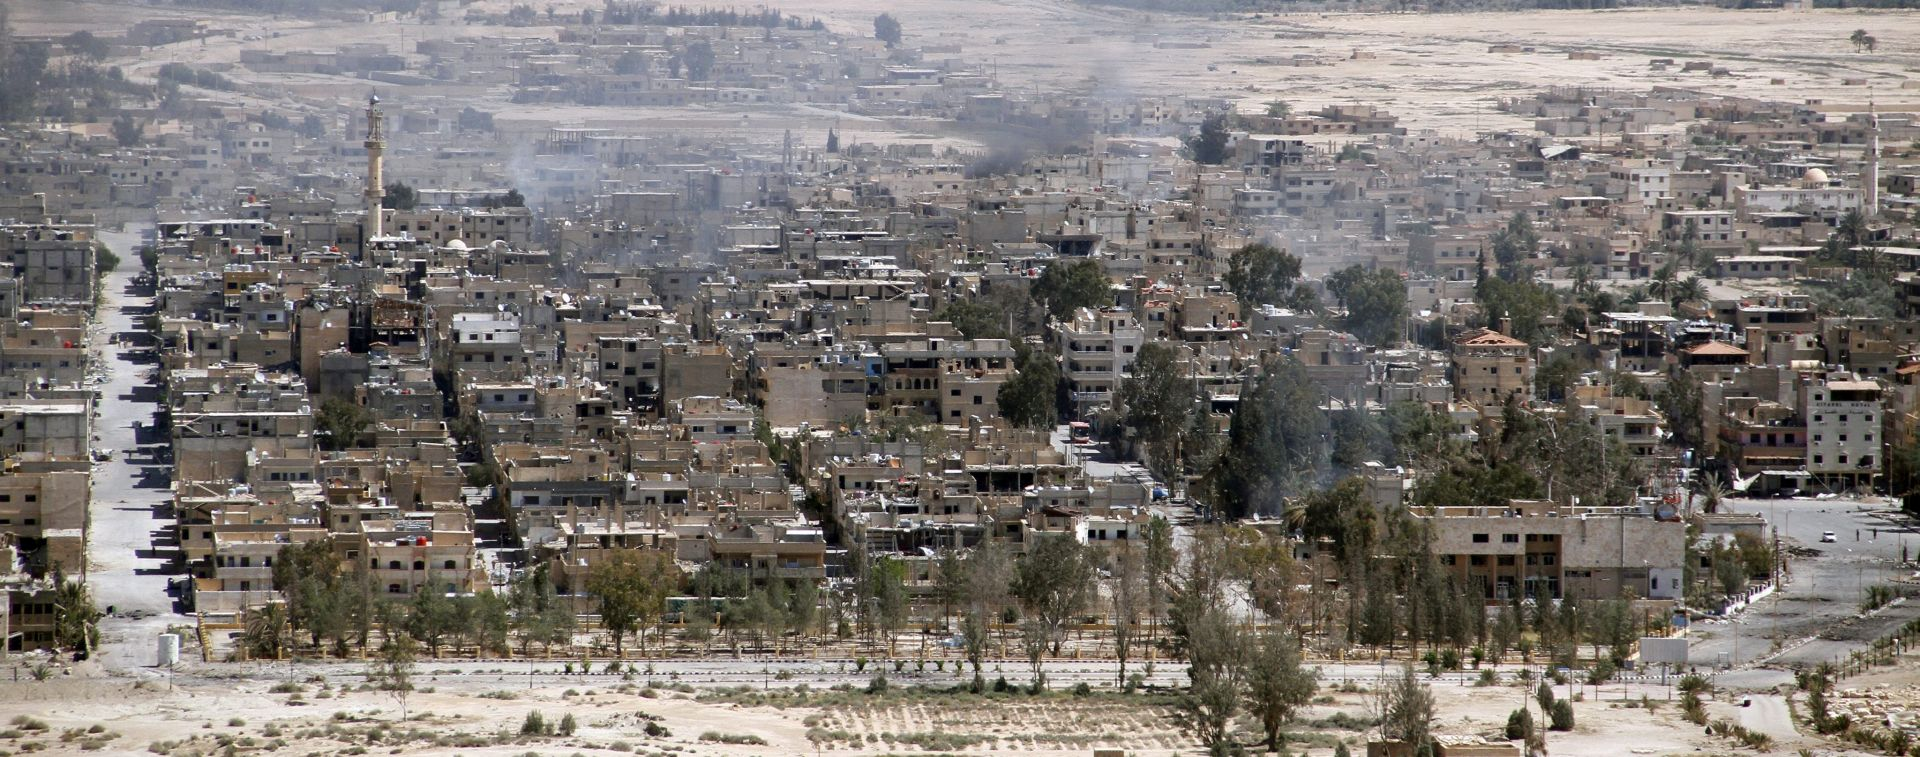 Sirijski mediji: Islamska država koristi bojni plin iperit